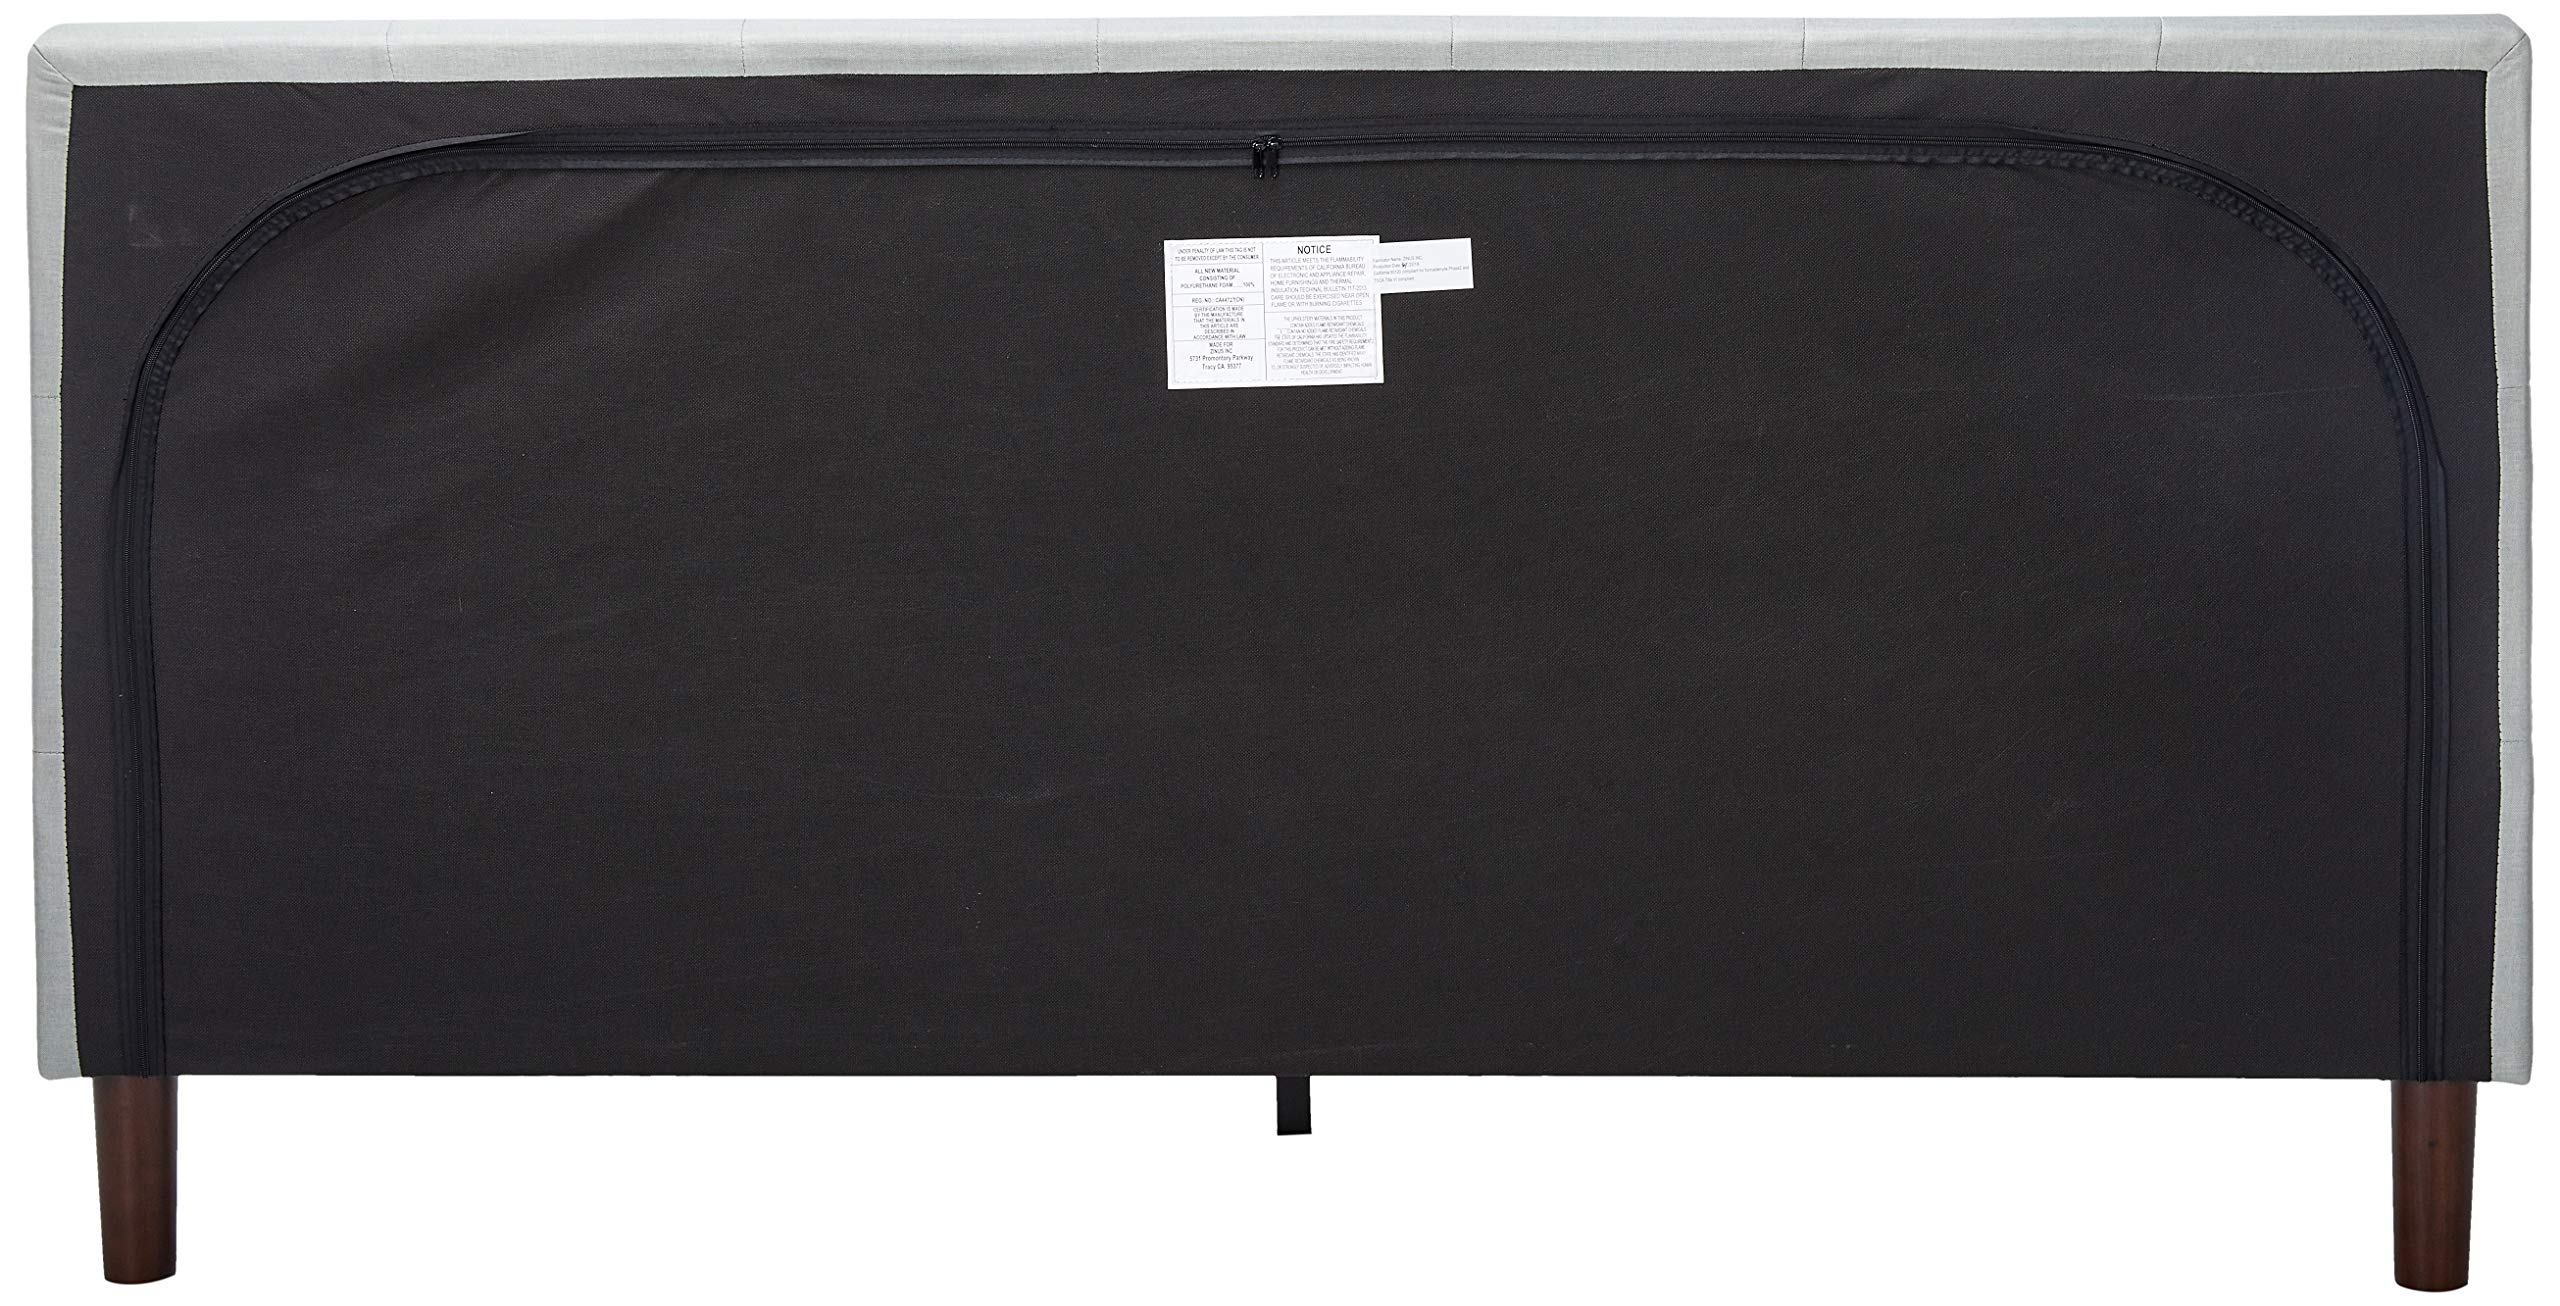 ZINUS Shalini Upholstered Platform Bed Frame with ZINUS 12 Inch Memory Foam Spring Hybrid Mattress